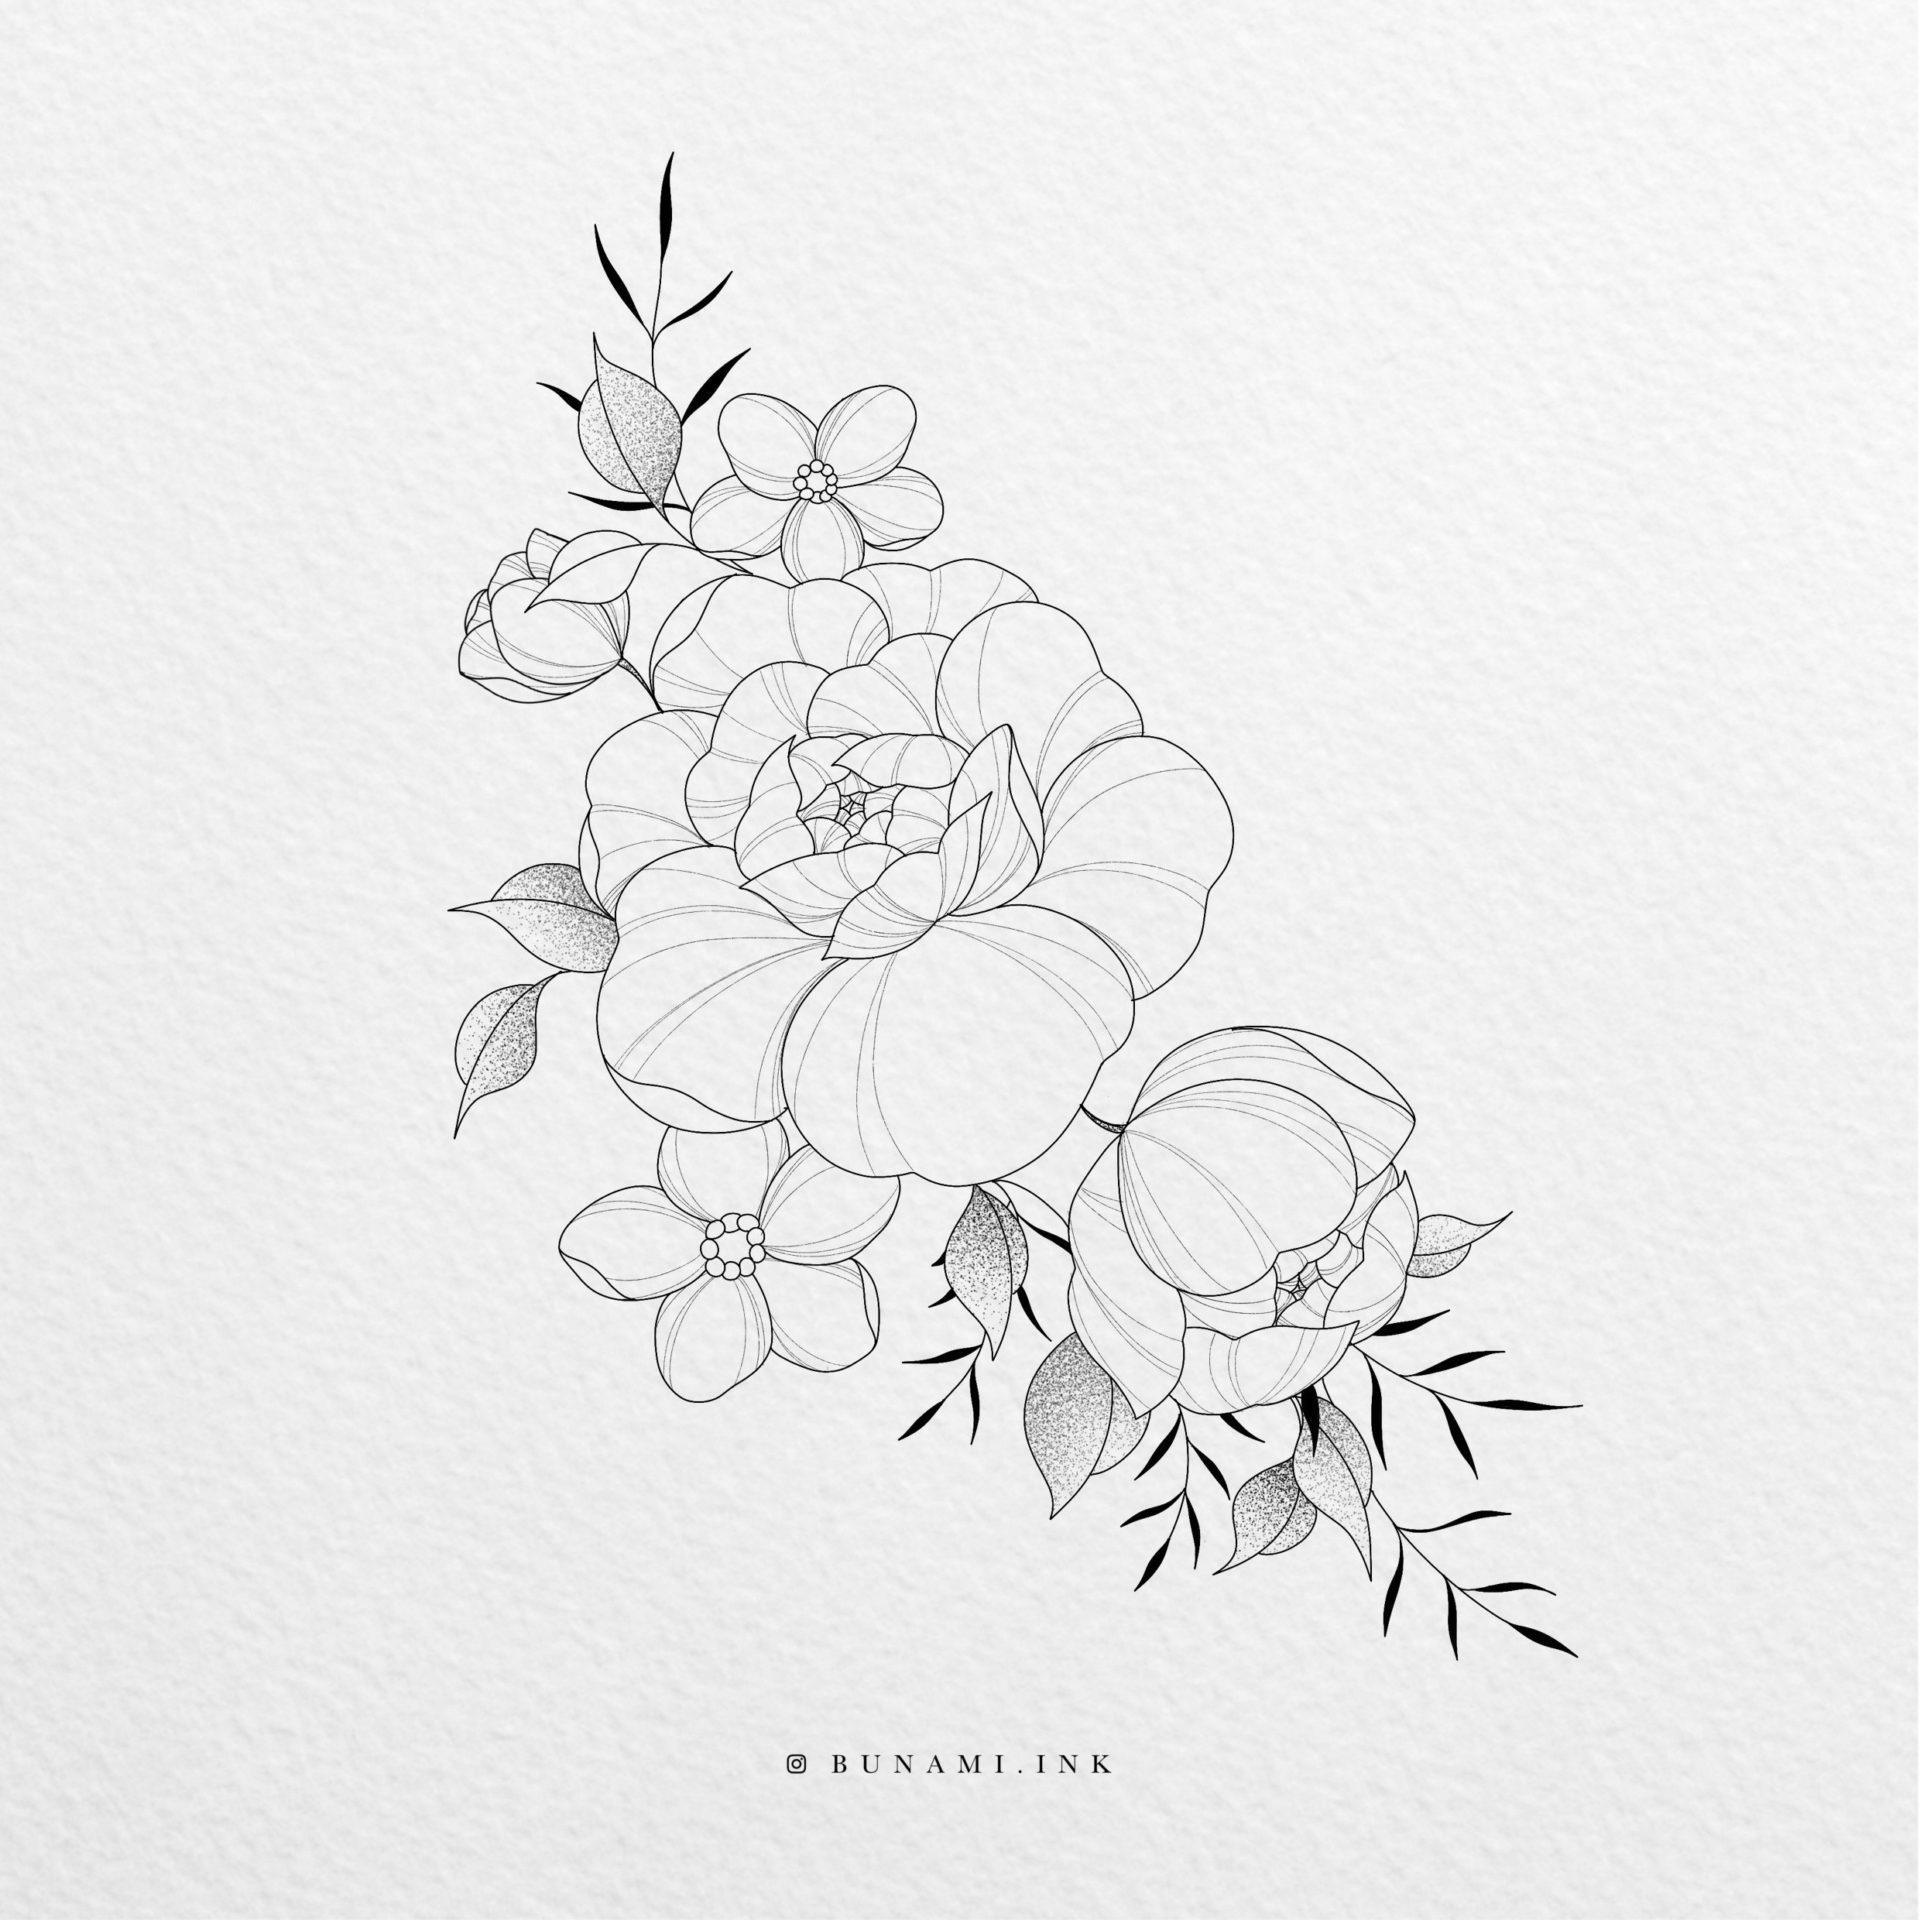 Big_peony_&_forgetmenot_floral_2020-03-12